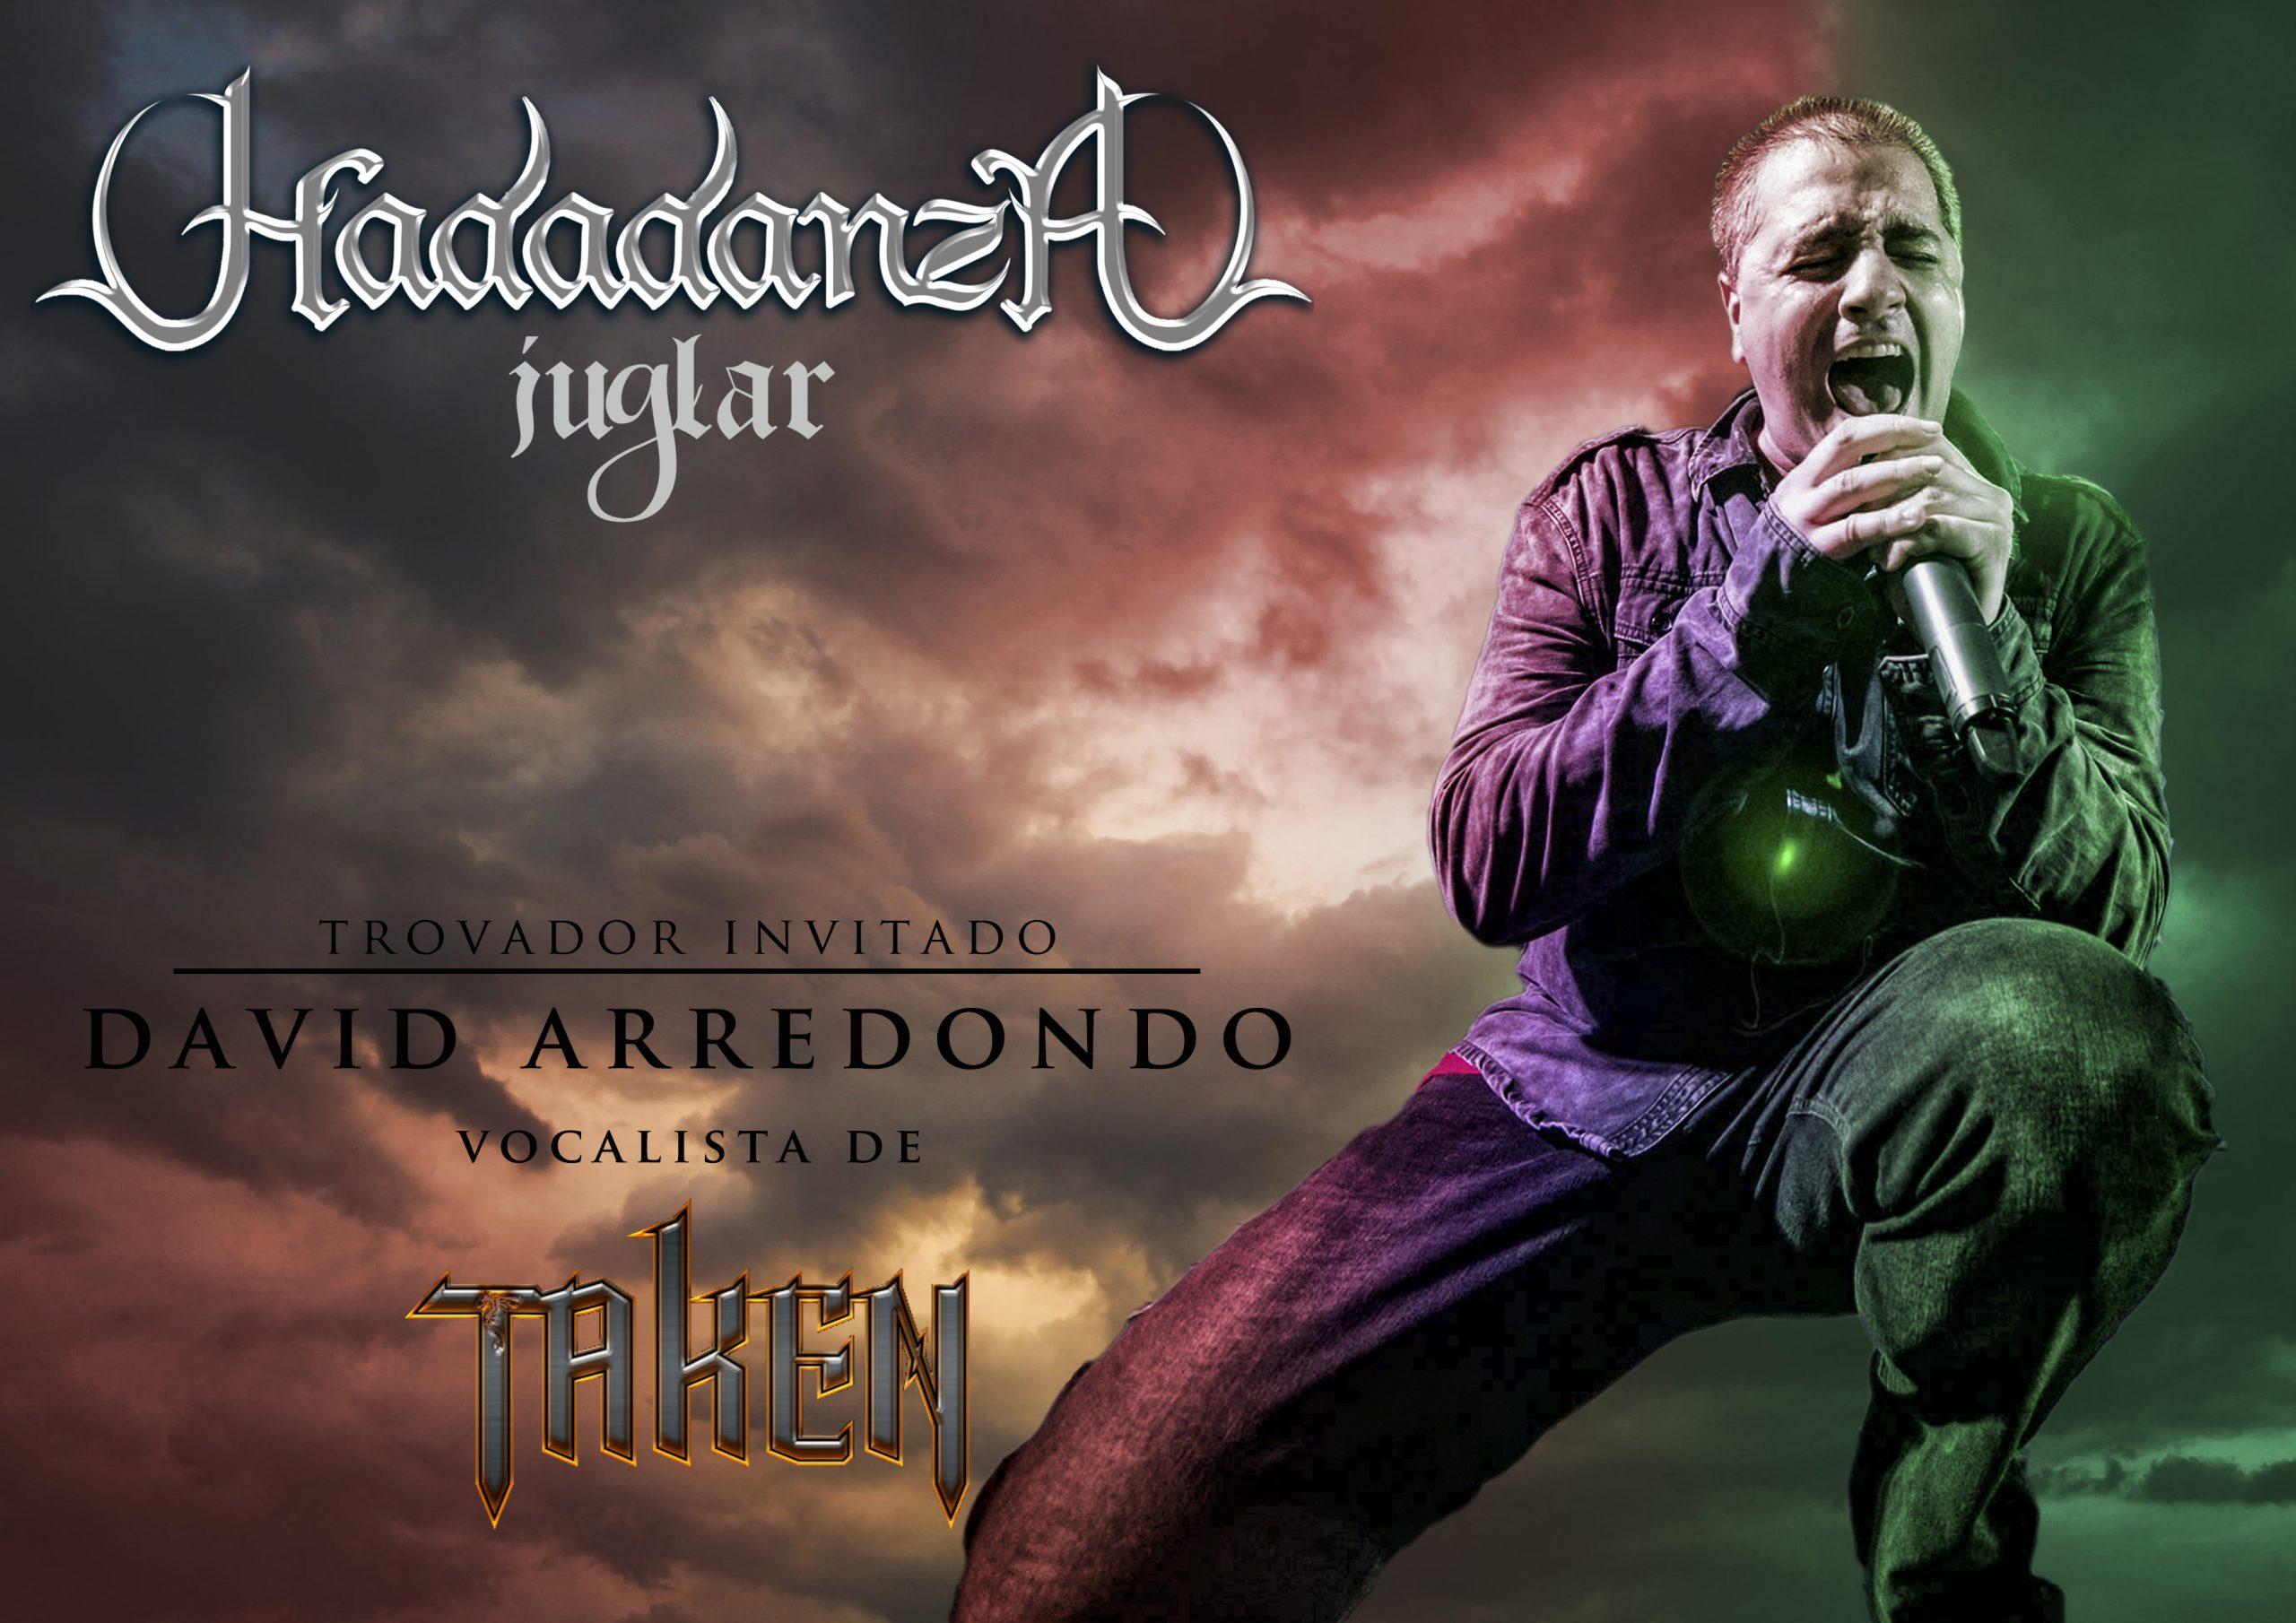 FOLK METAL ROCK - DAVID ARREDONDO EN JUGLAR